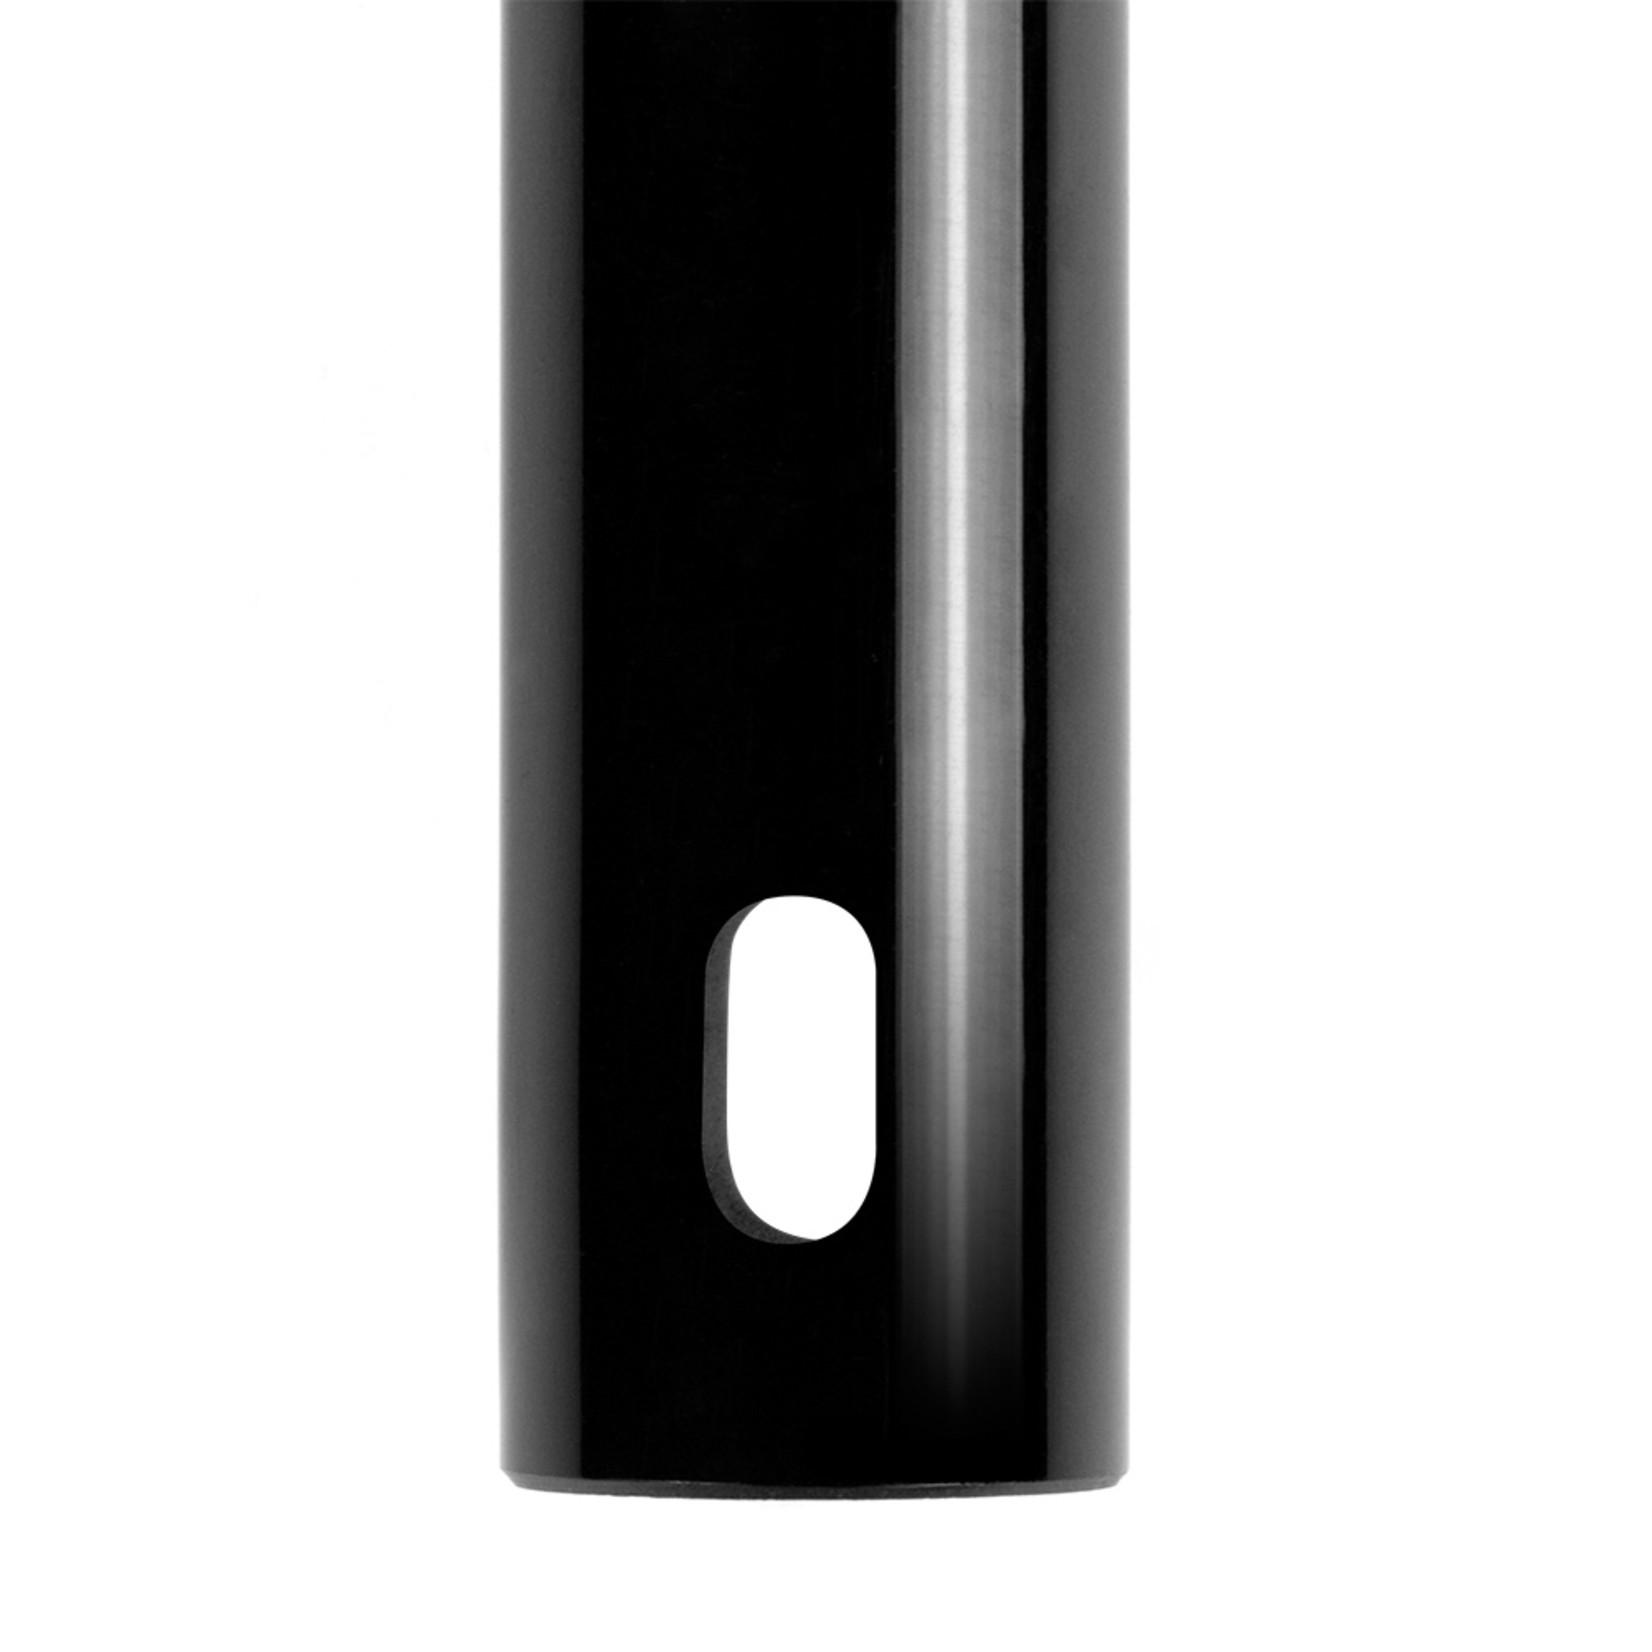 Sensorex CS150 Geleidbaarheid sensor  K 1.0